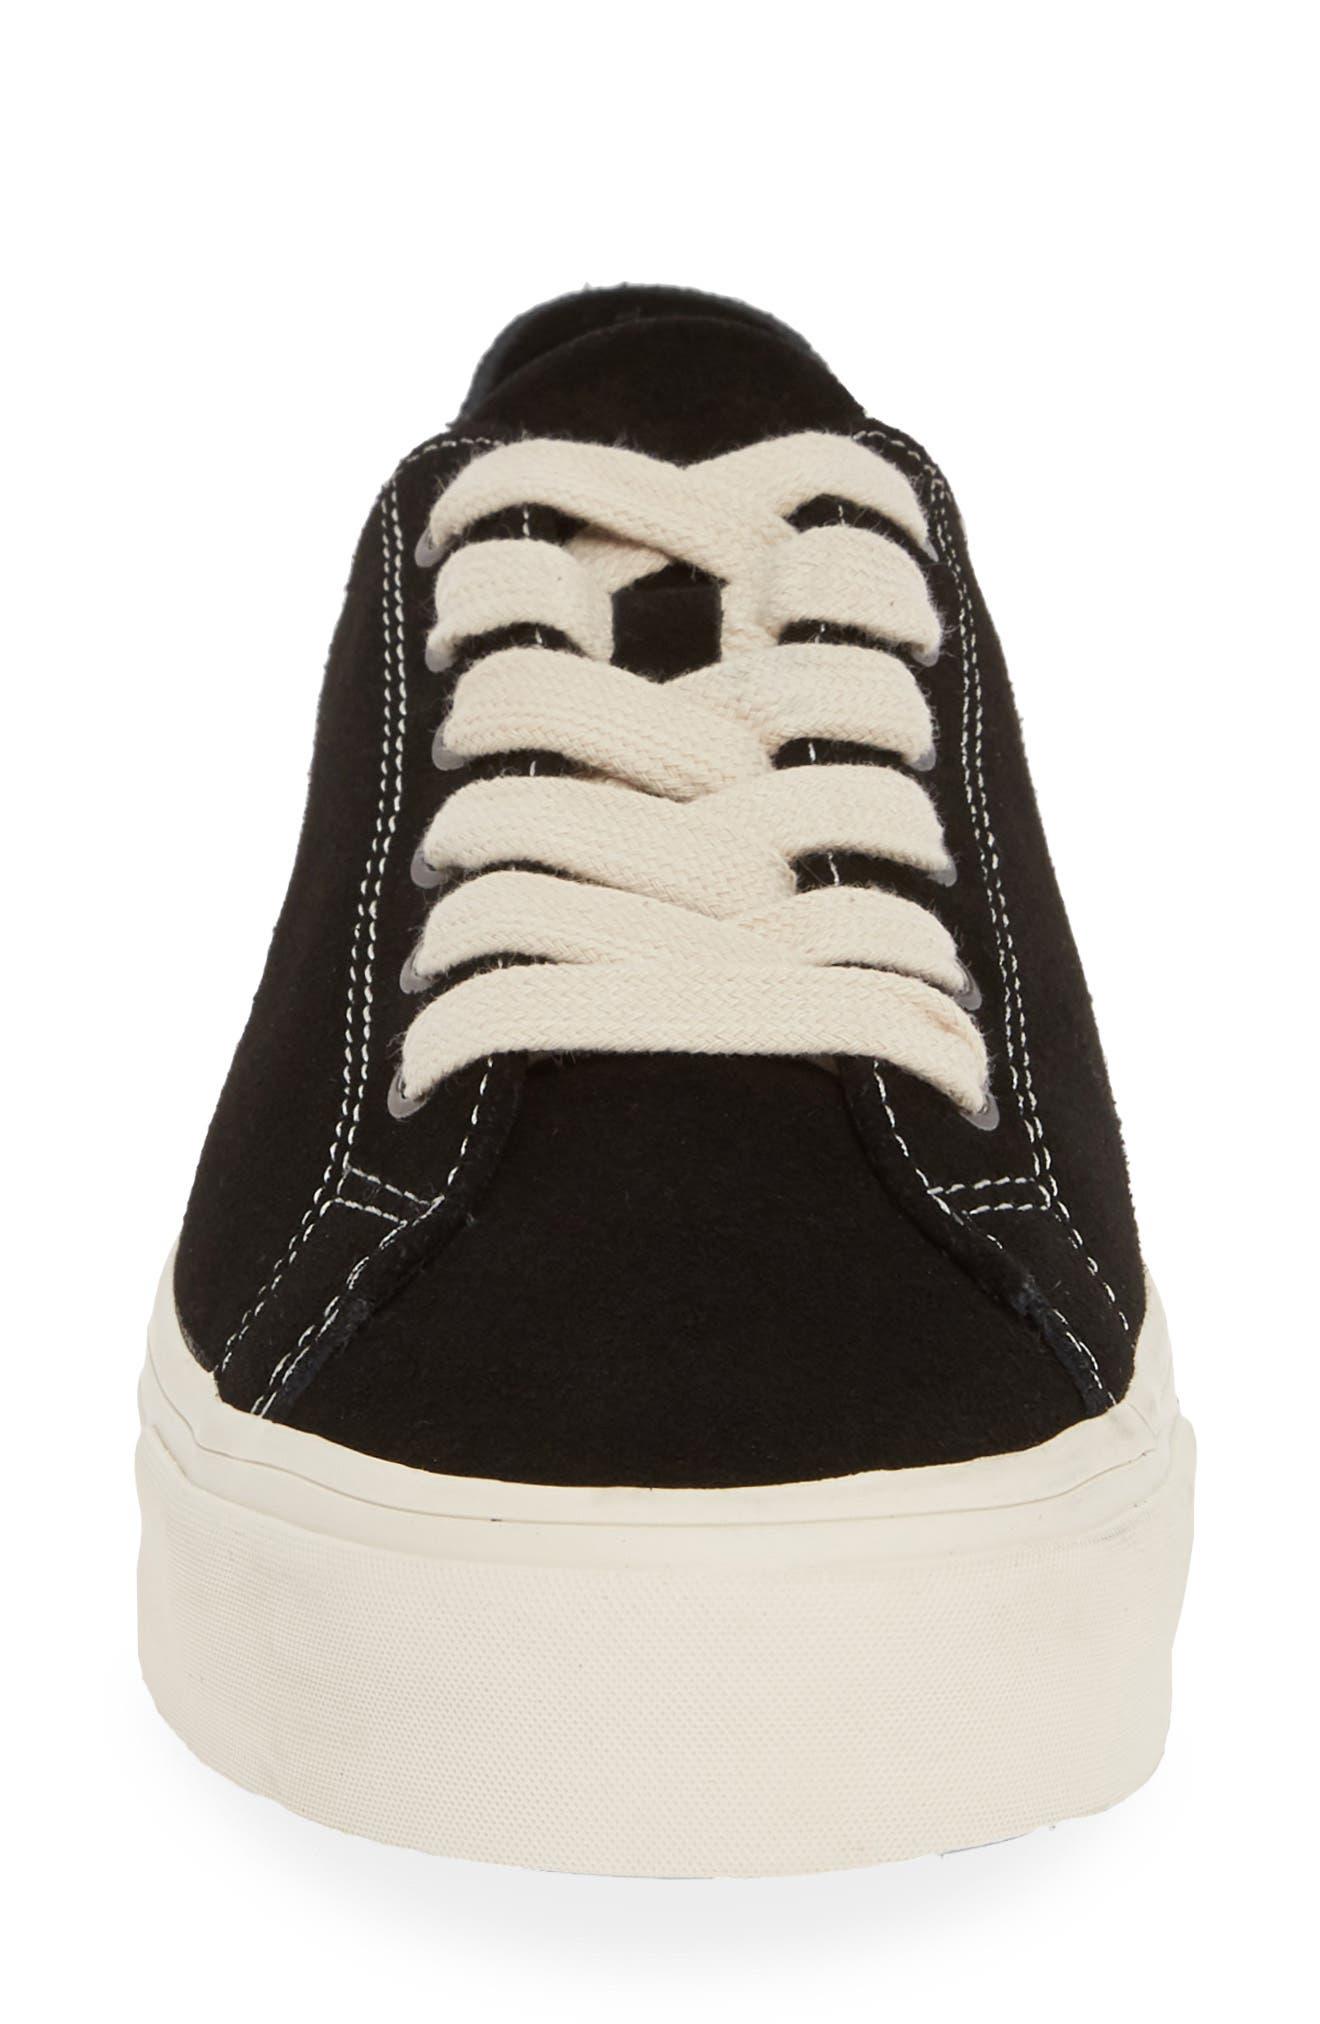 SEAVEES,                             Sausalito Sneaker,                             Alternate thumbnail 4, color,                             BLACK/ BLACK